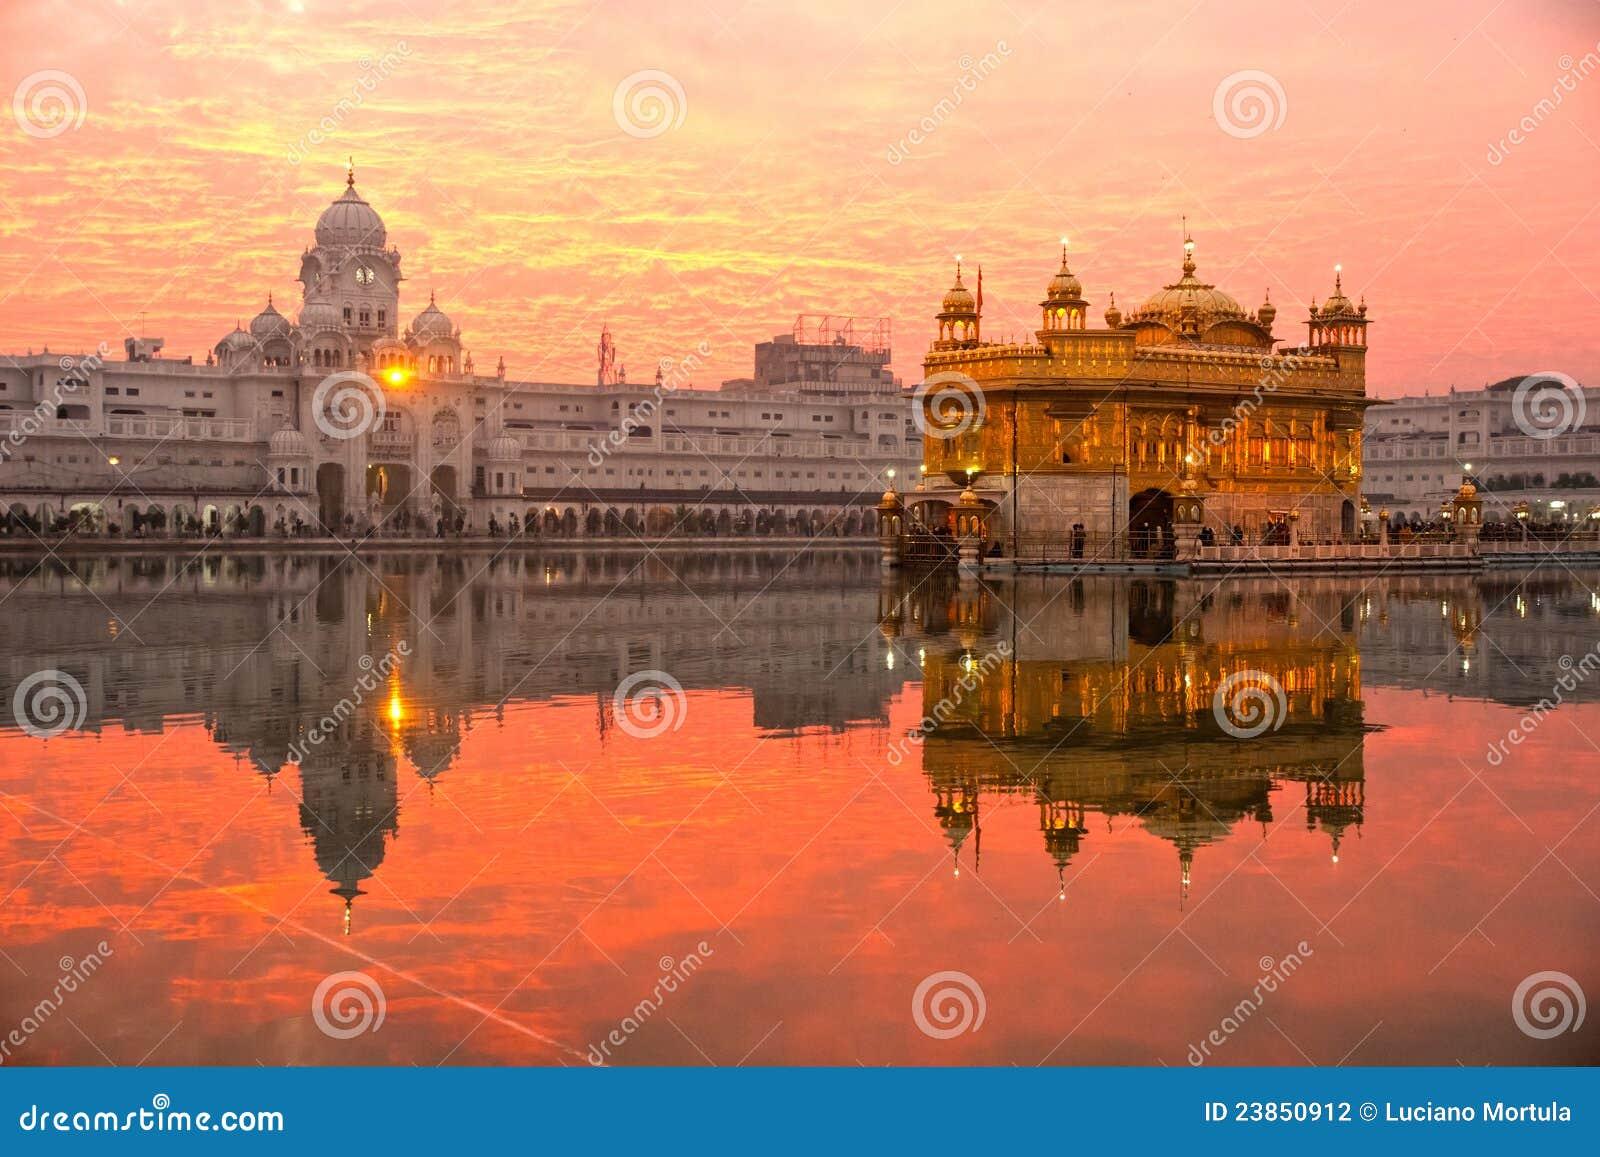 Templo de oro, Punjab, la India.